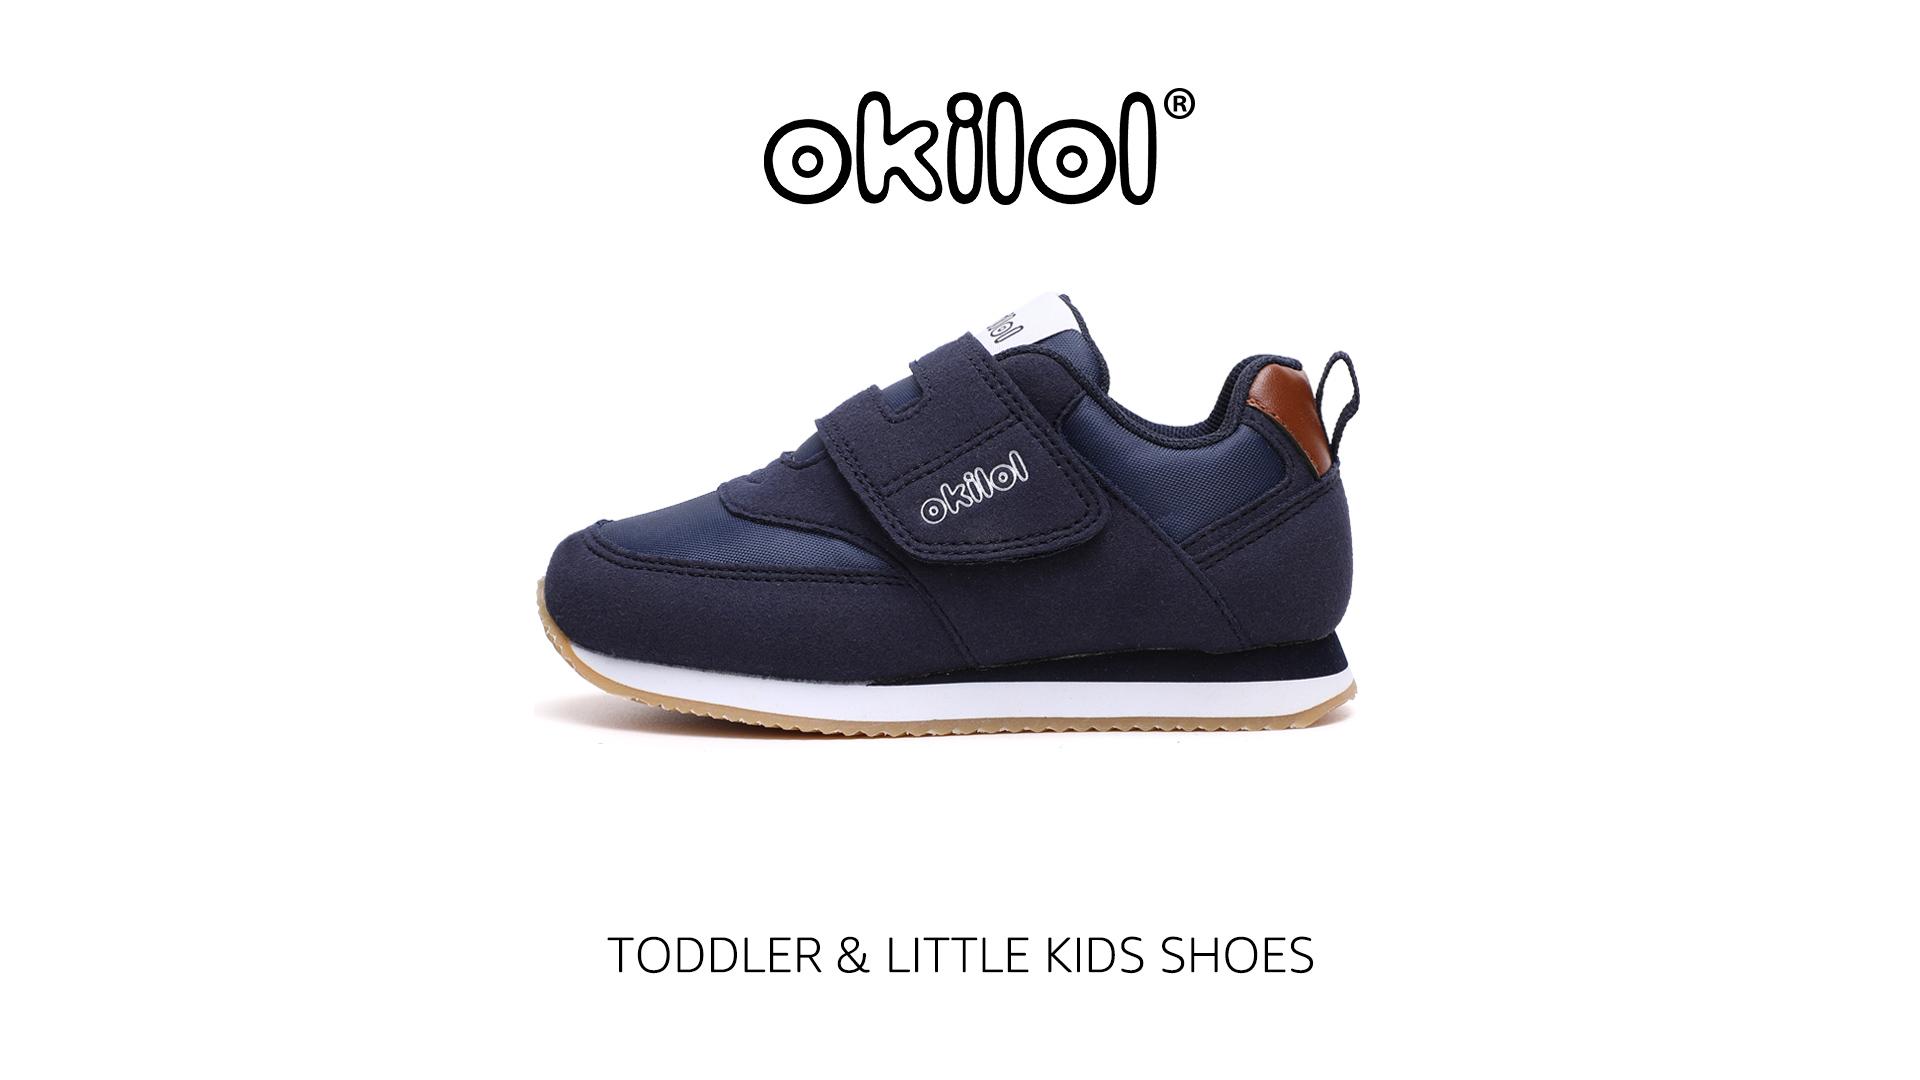 Boys /& Girls Comfort Retro Sneaker School okilol Toddler Shoes Kids Tennis Shoes for Comfort Walk Playground Fun